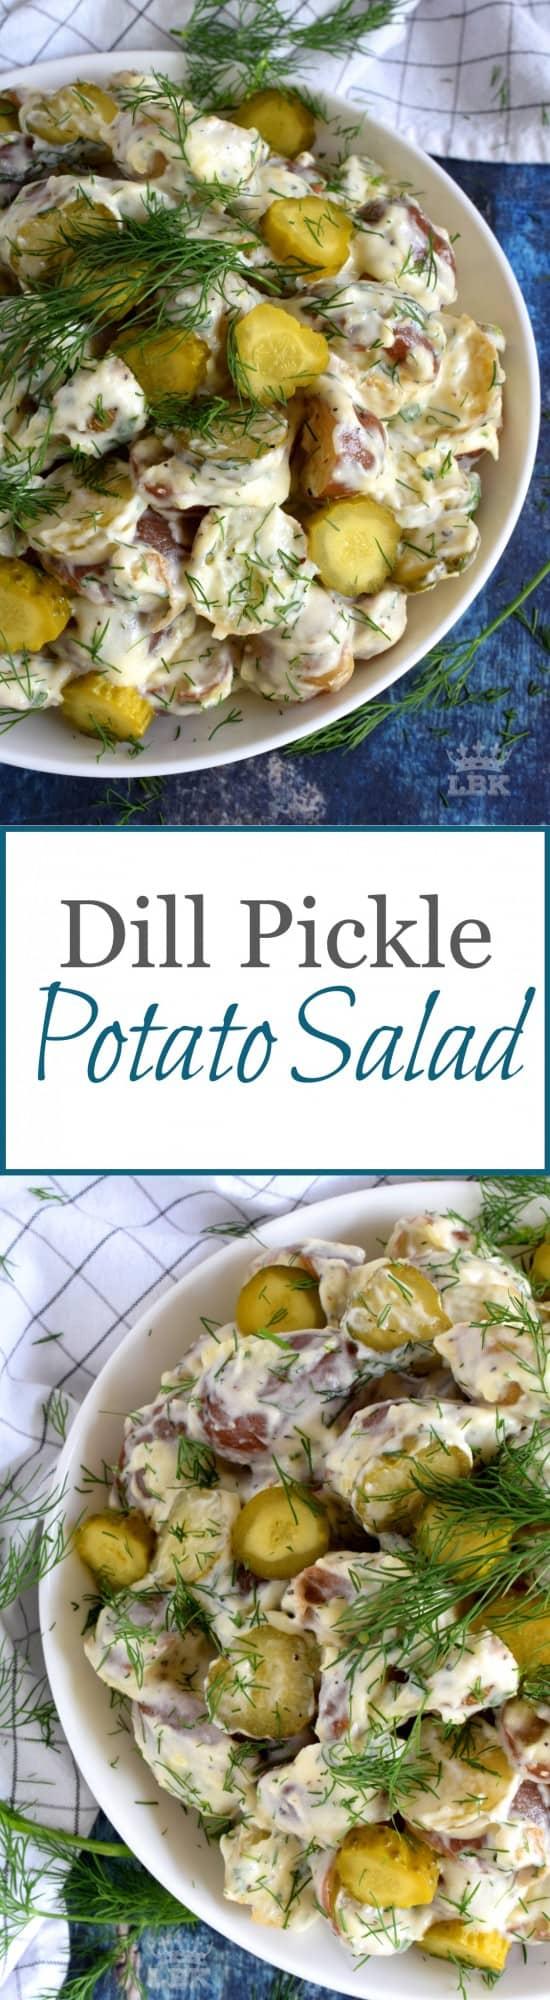 Dill Pickle Potato Salad